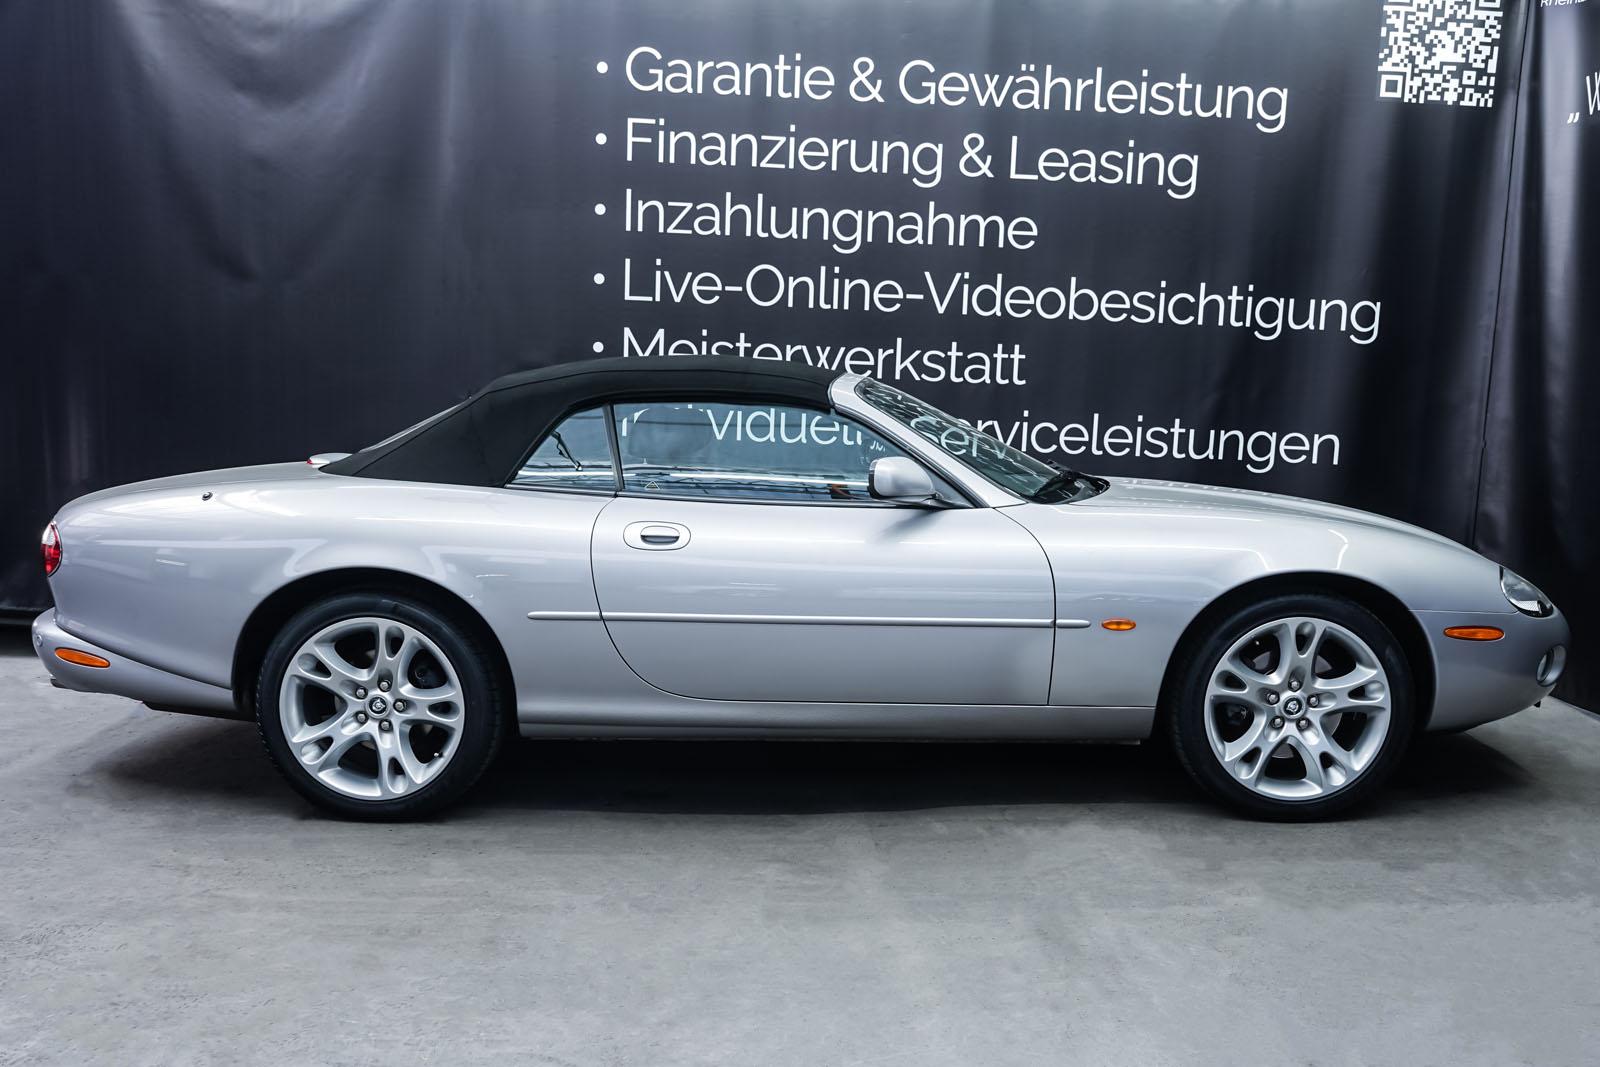 Jaguar_XK8_4.0_Silber_Schwarz_JAG-9731_20_w